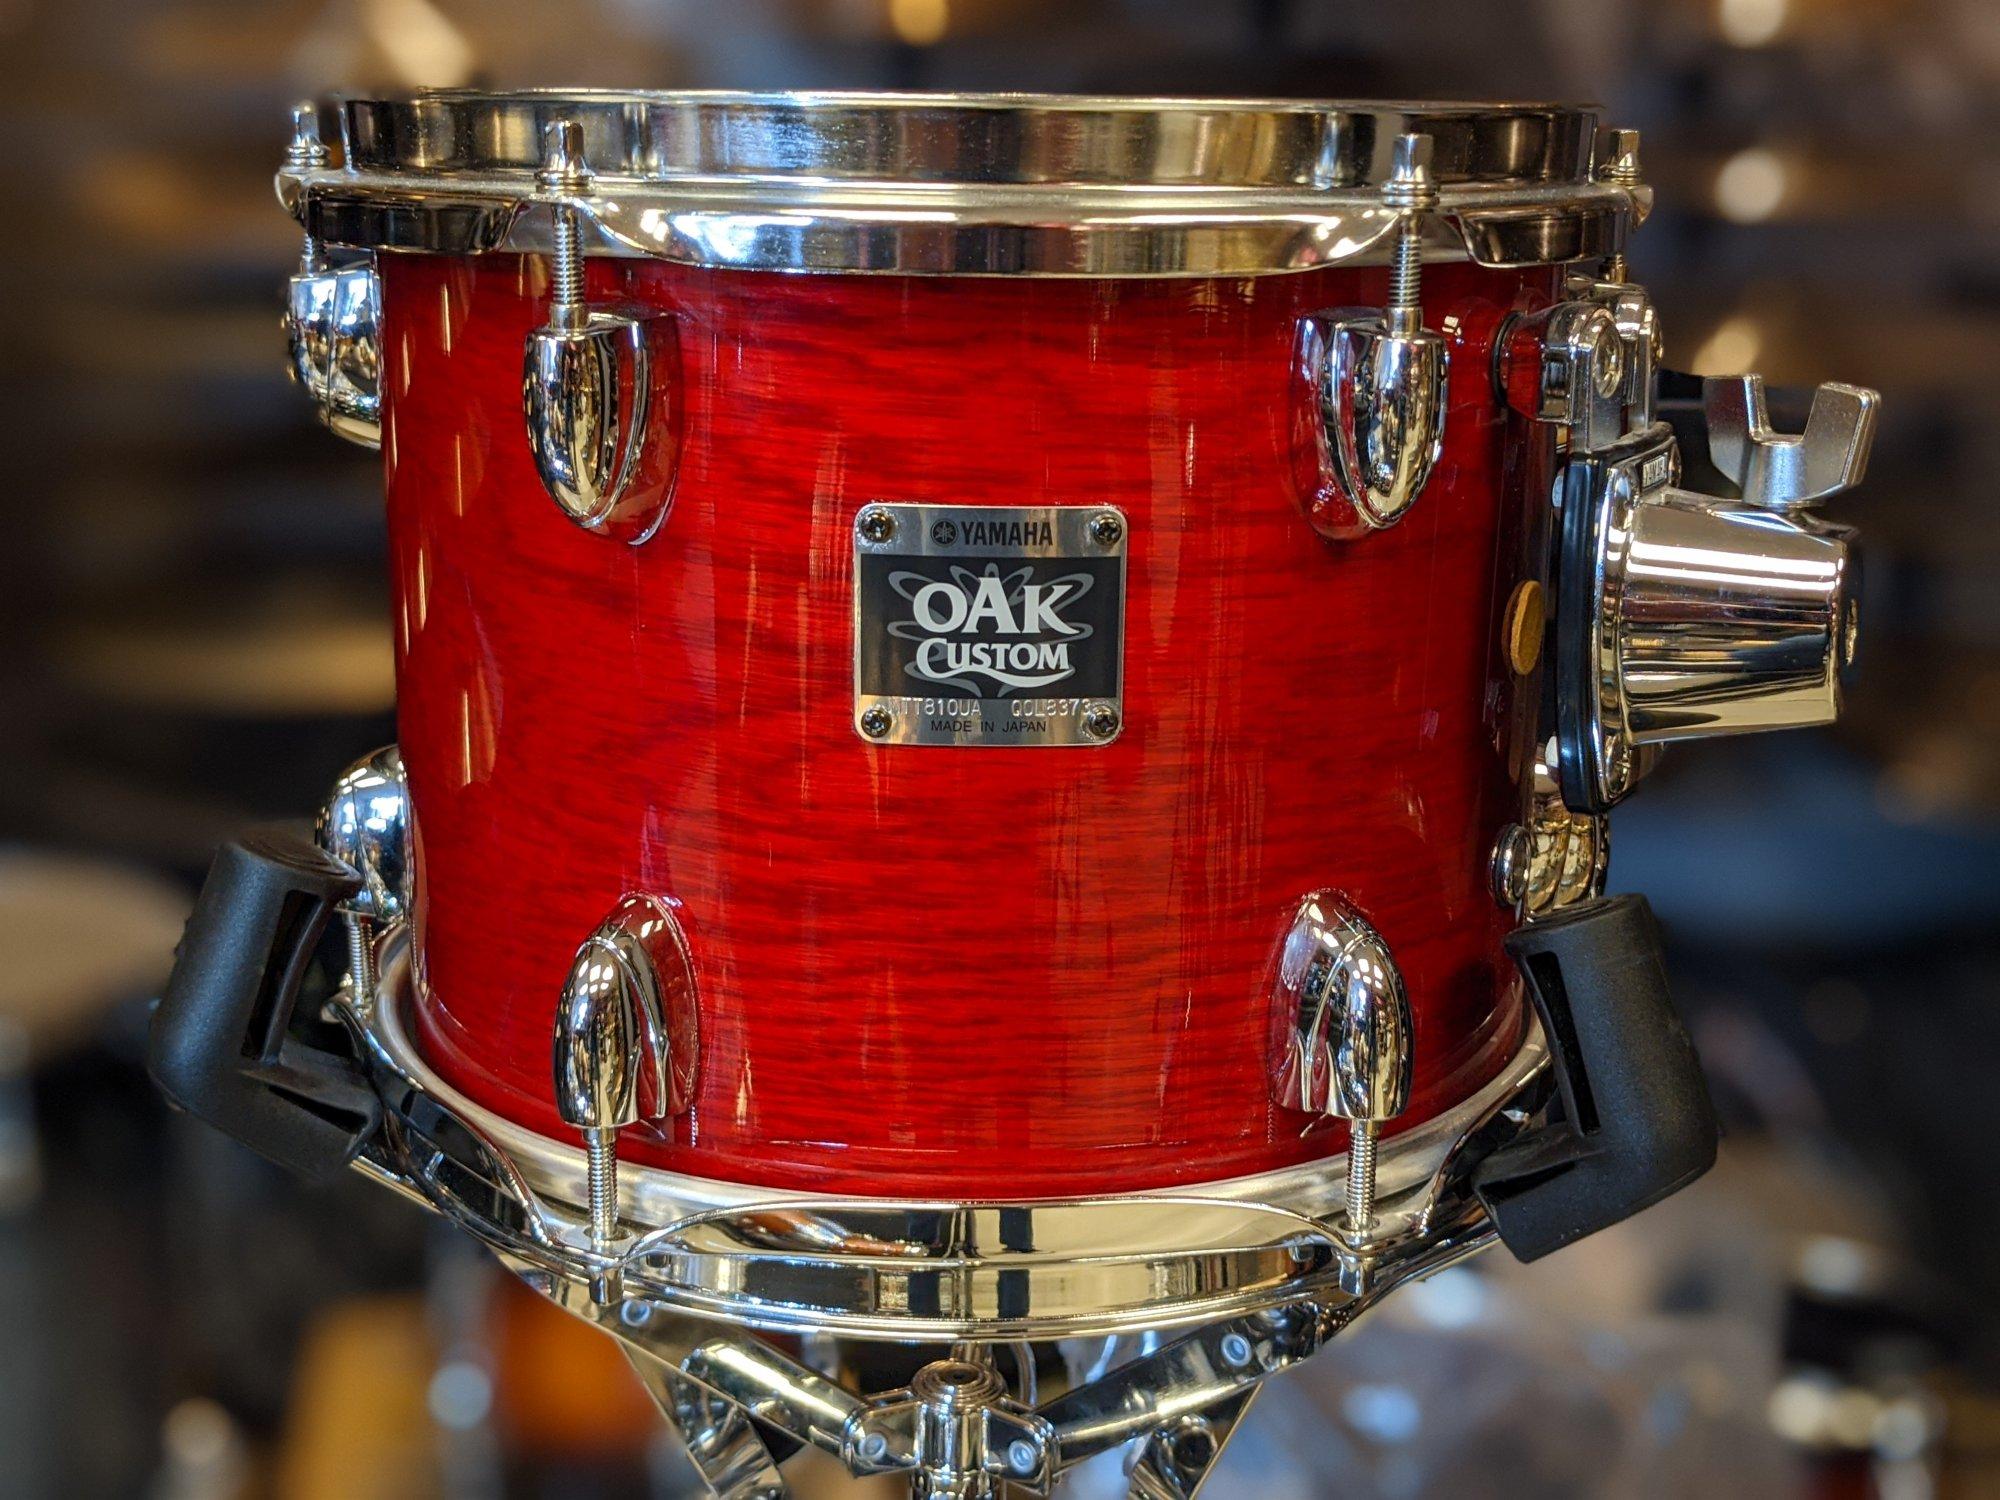 Yamaha Oak Custom Tom Red 8 x 10